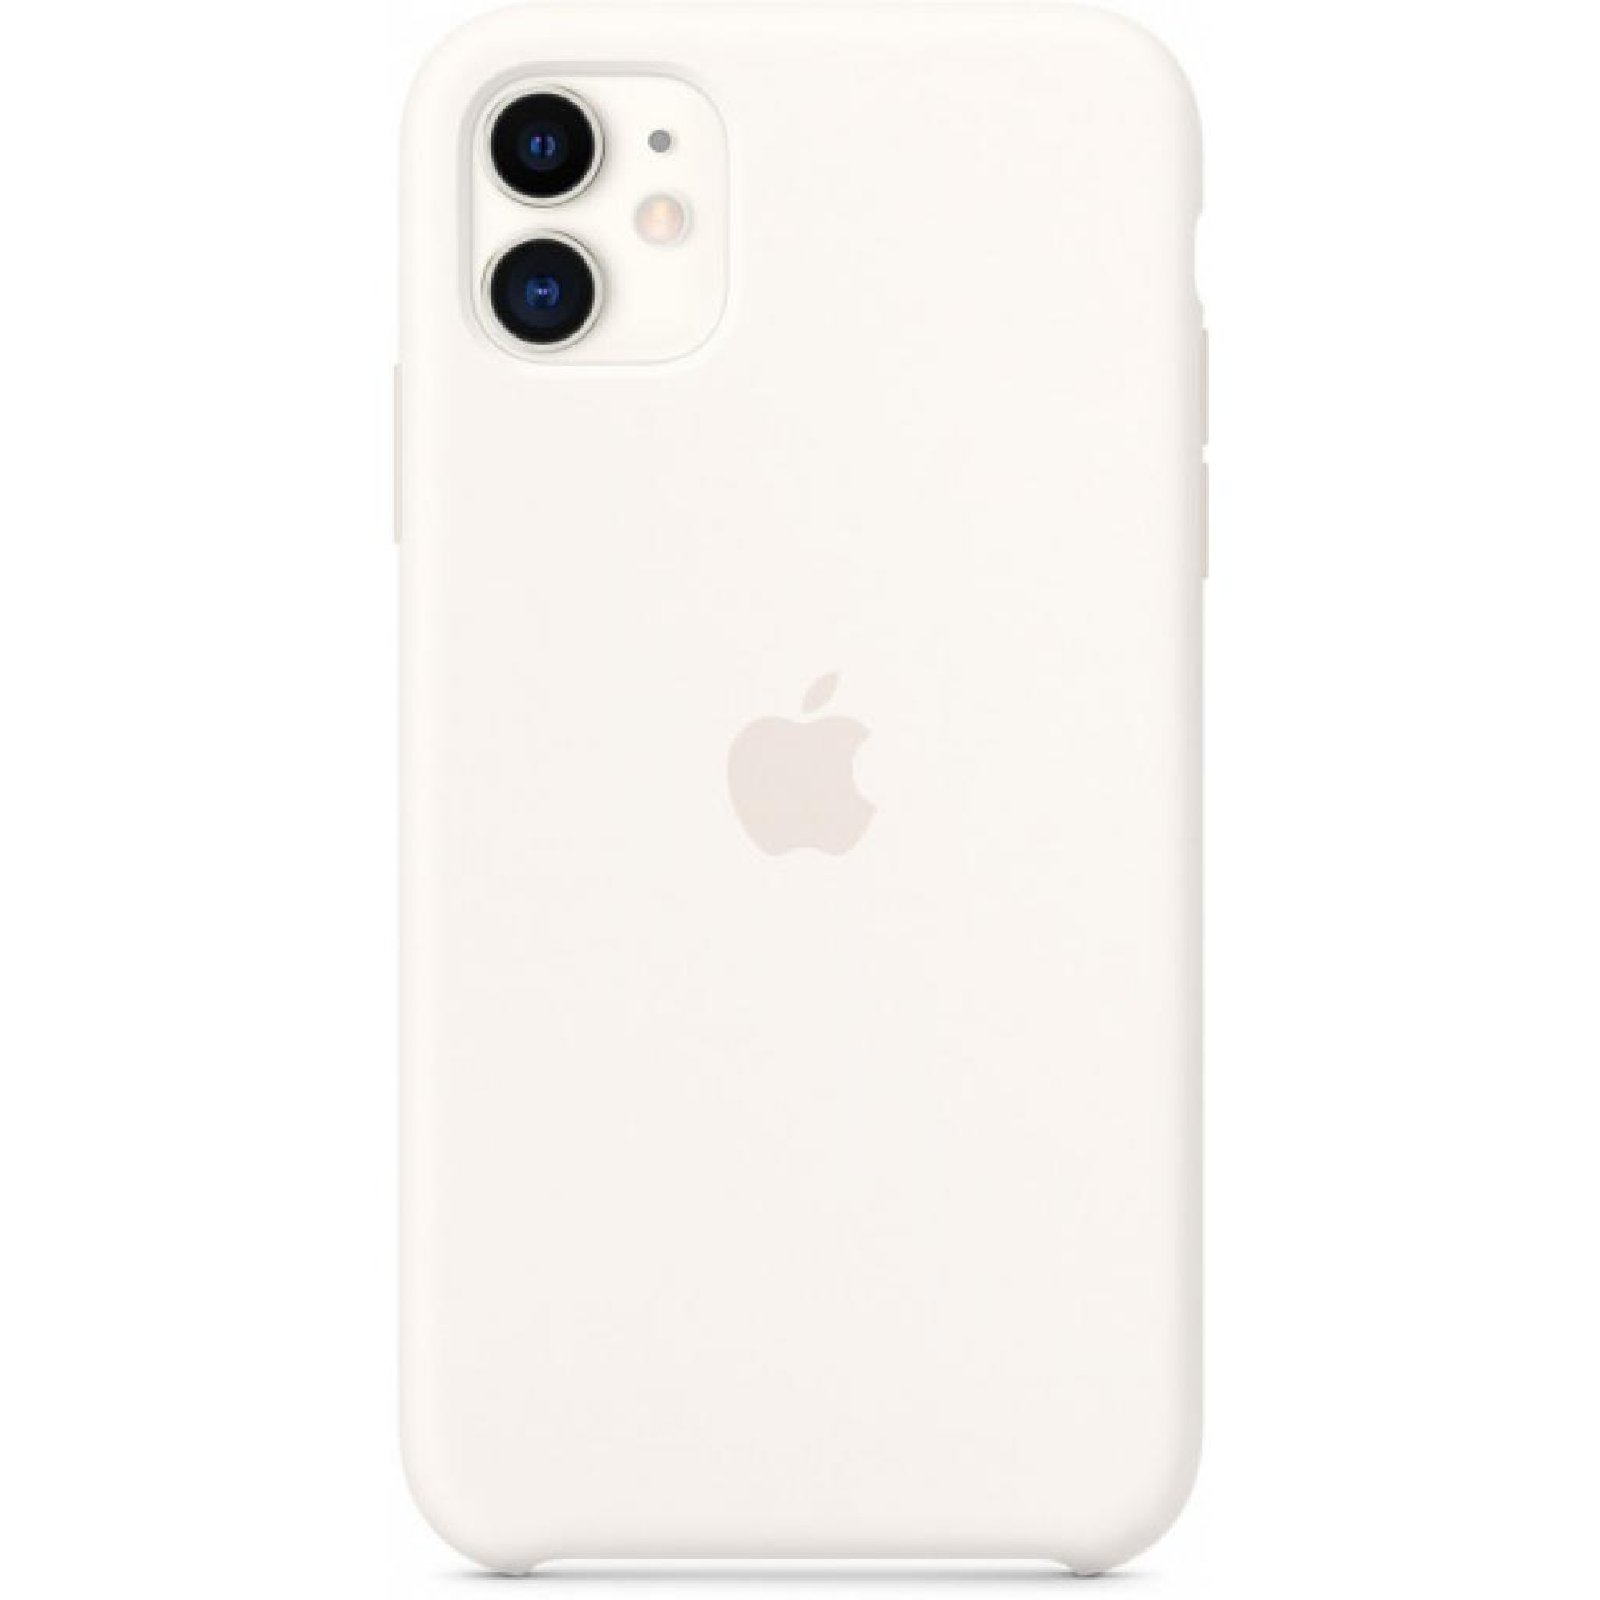 Чехол для моб. телефона Apple iPhone 11 Silicone Case - Black (MWVU2ZM/A)